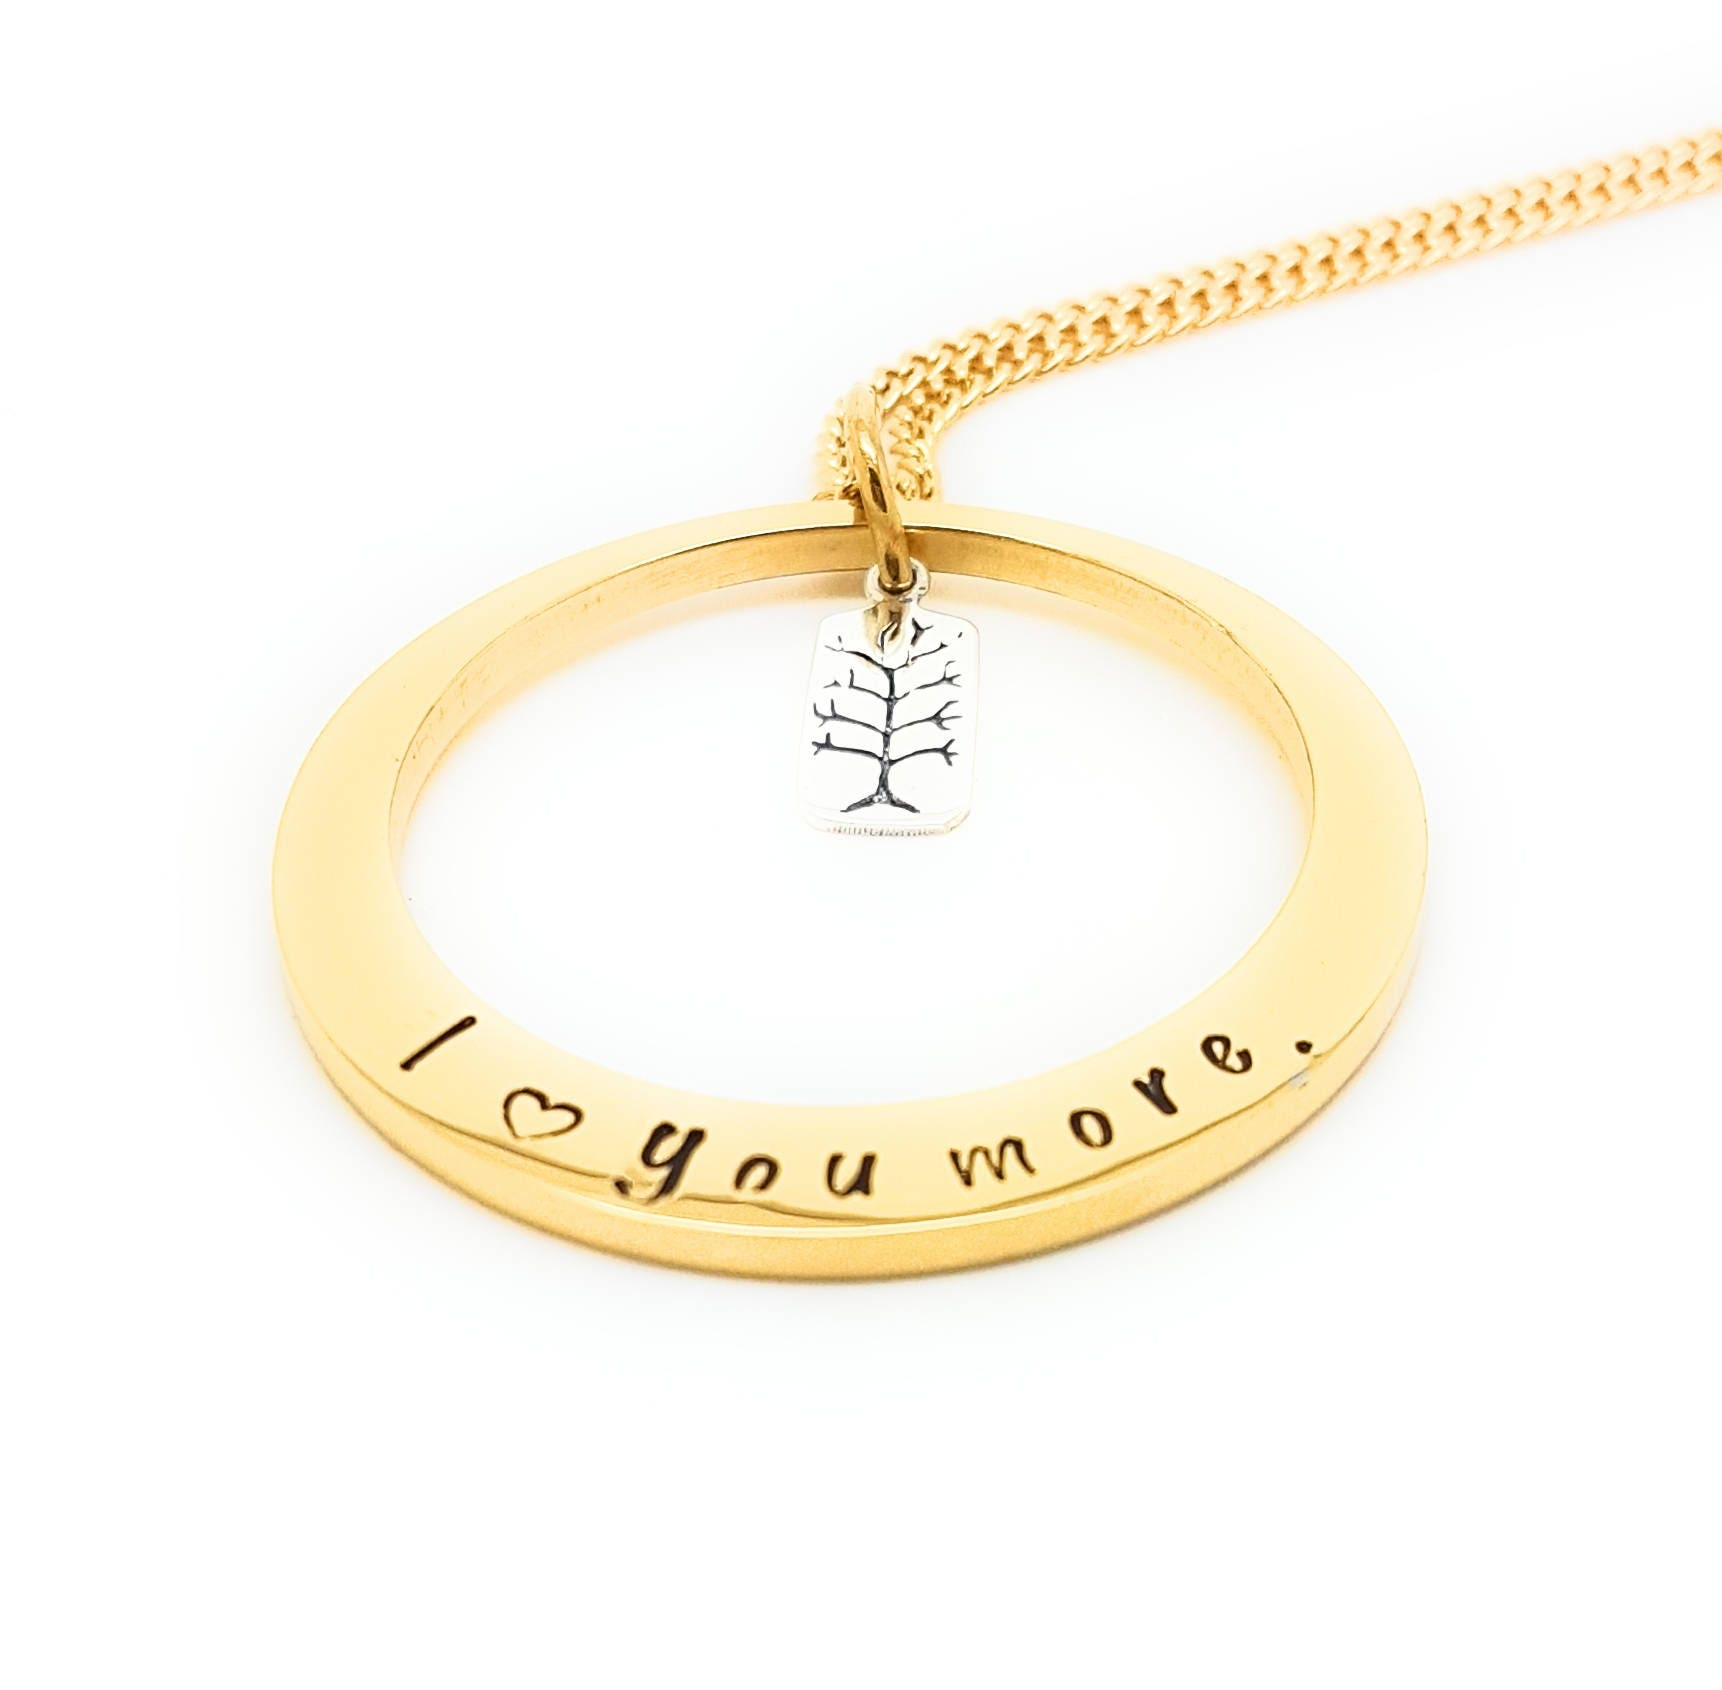 Name pendants australia light ideas light ideas family names tree of life pendant personalised jewellery hand aloadofball Image collections